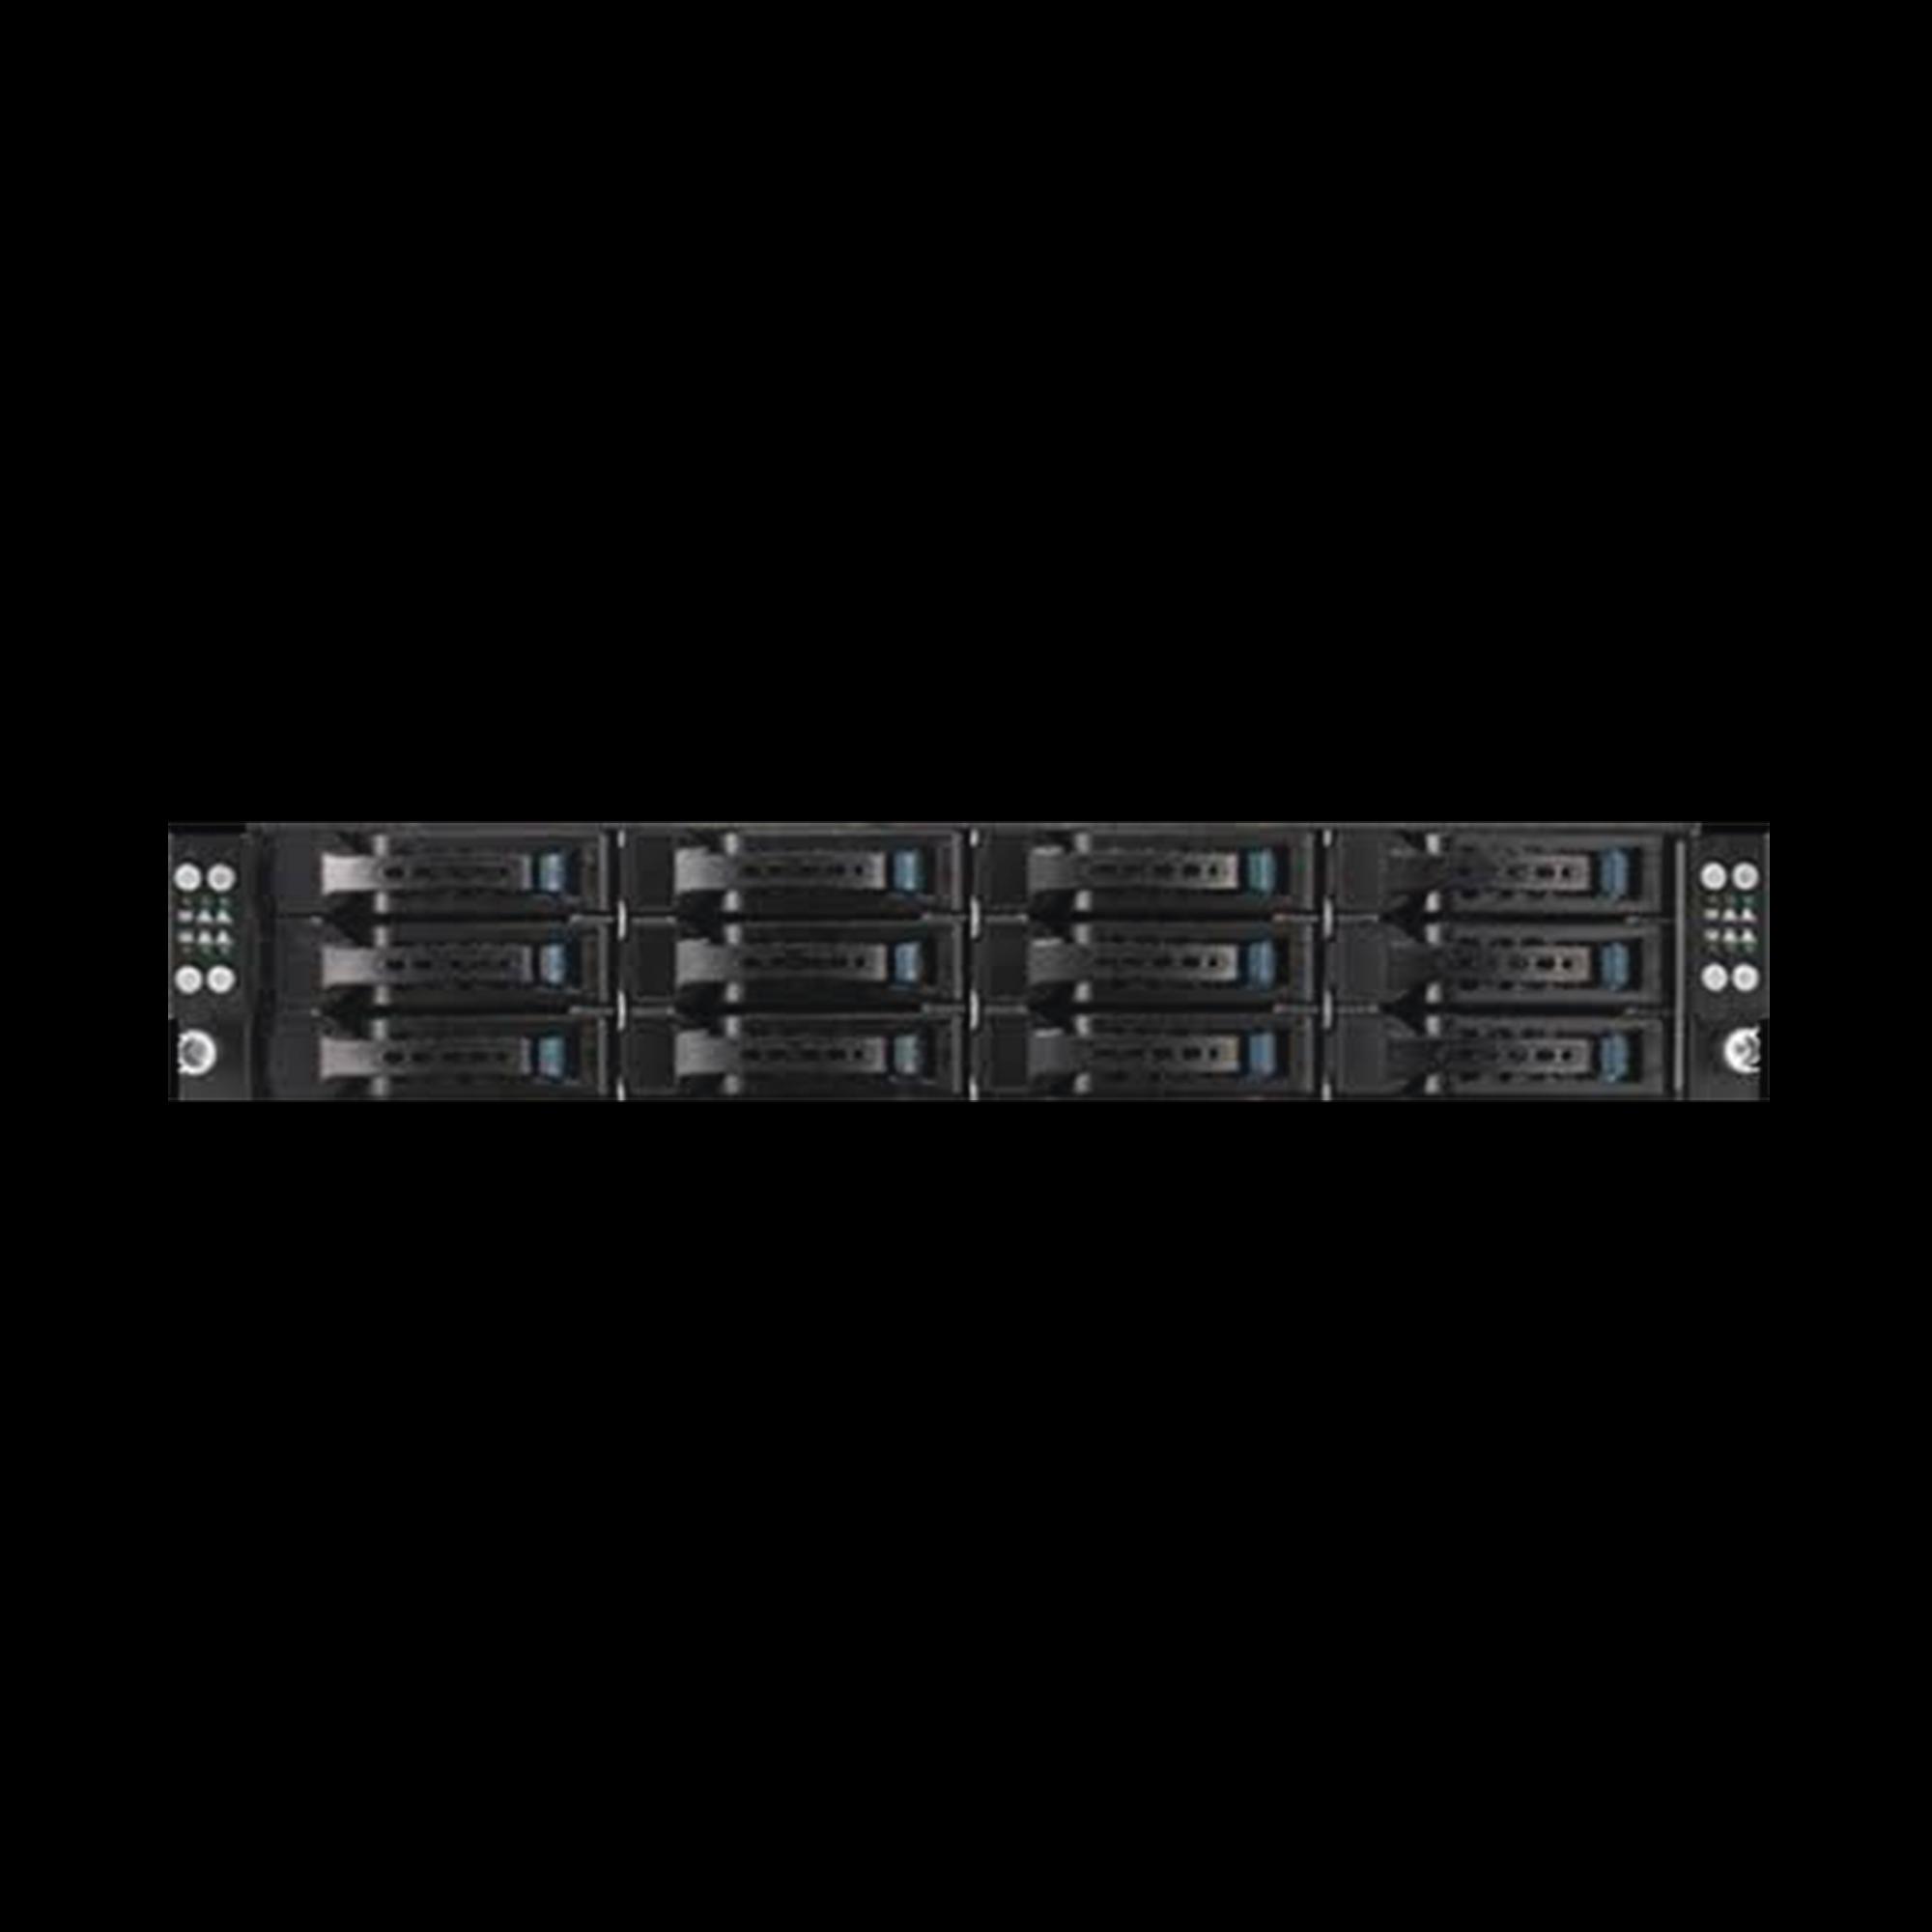 Servidor de Administracion / fuente de poder redundante / Con 4 nodos (Doble Intel Xeon / Doble disco de estado solido 120GB / 3GBE / 16GB RAM)